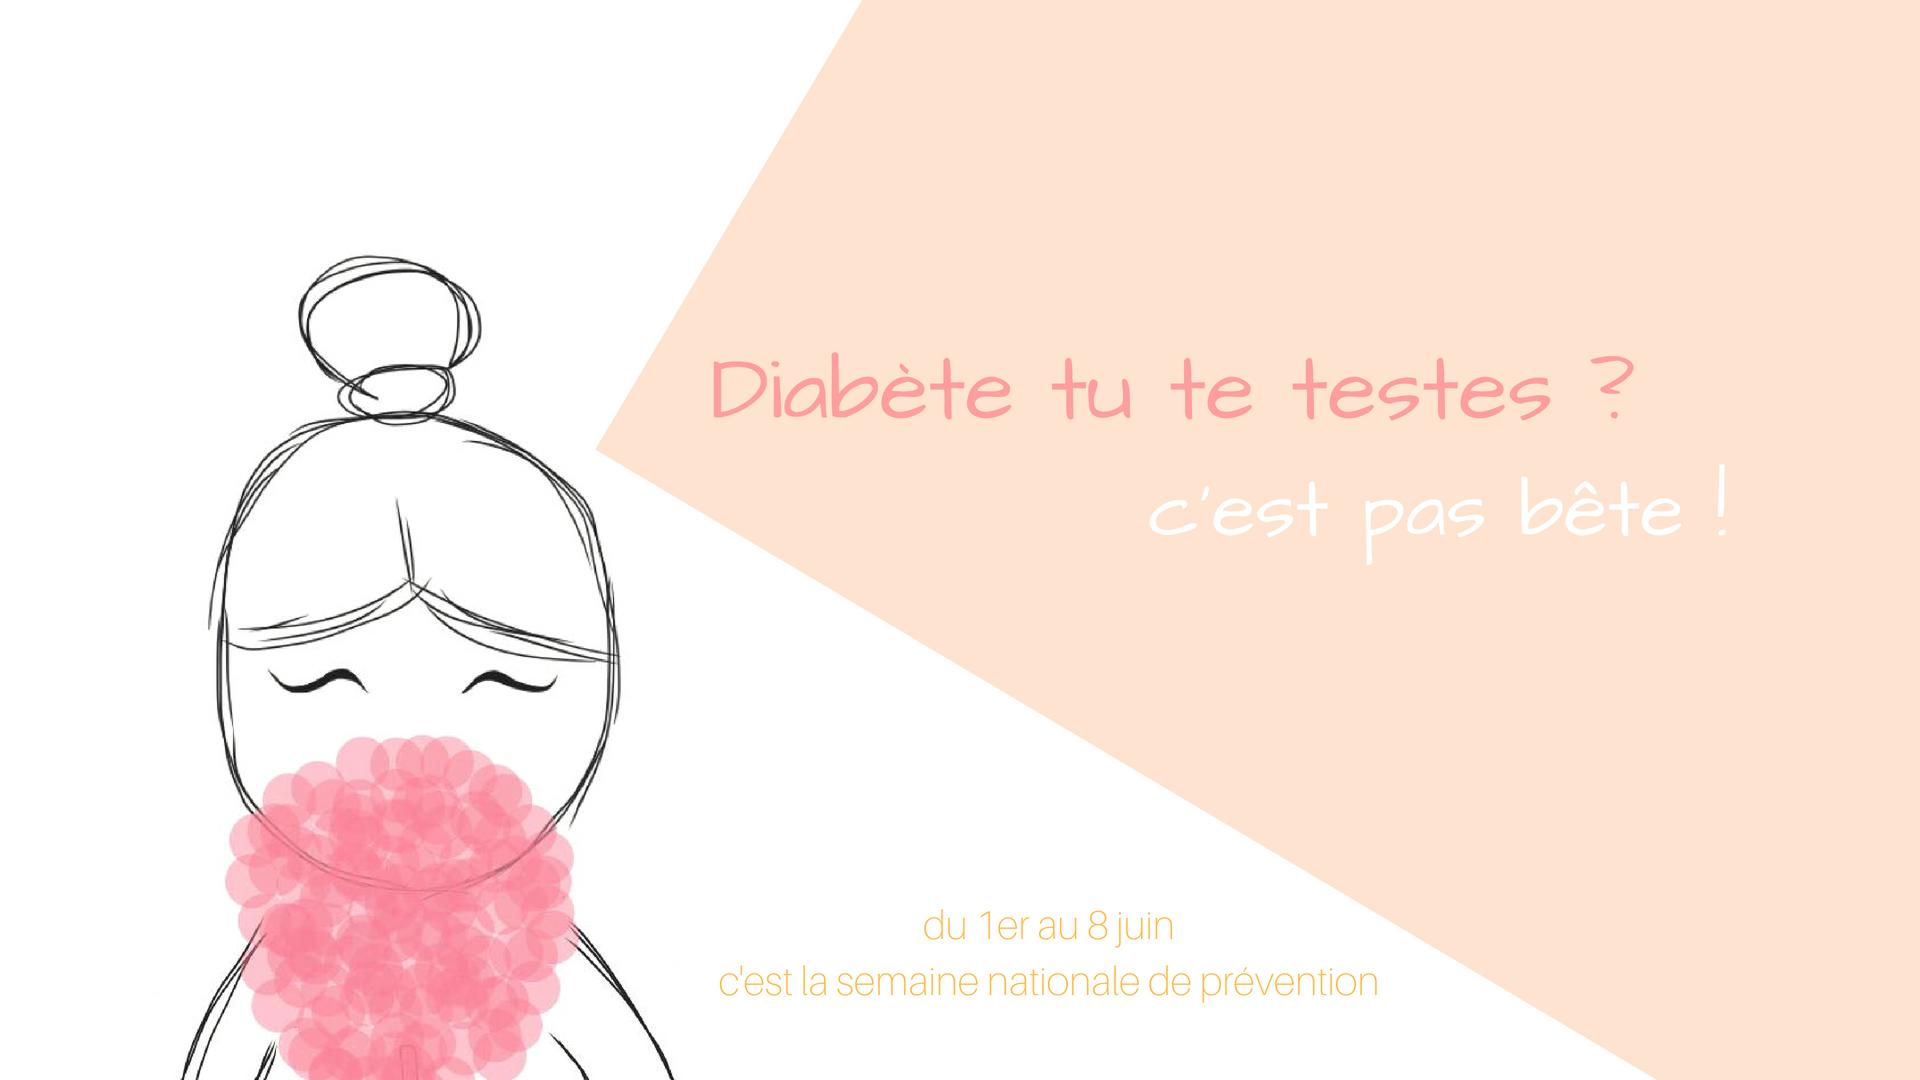 Diabète tu te testes ? C'est pas bête !